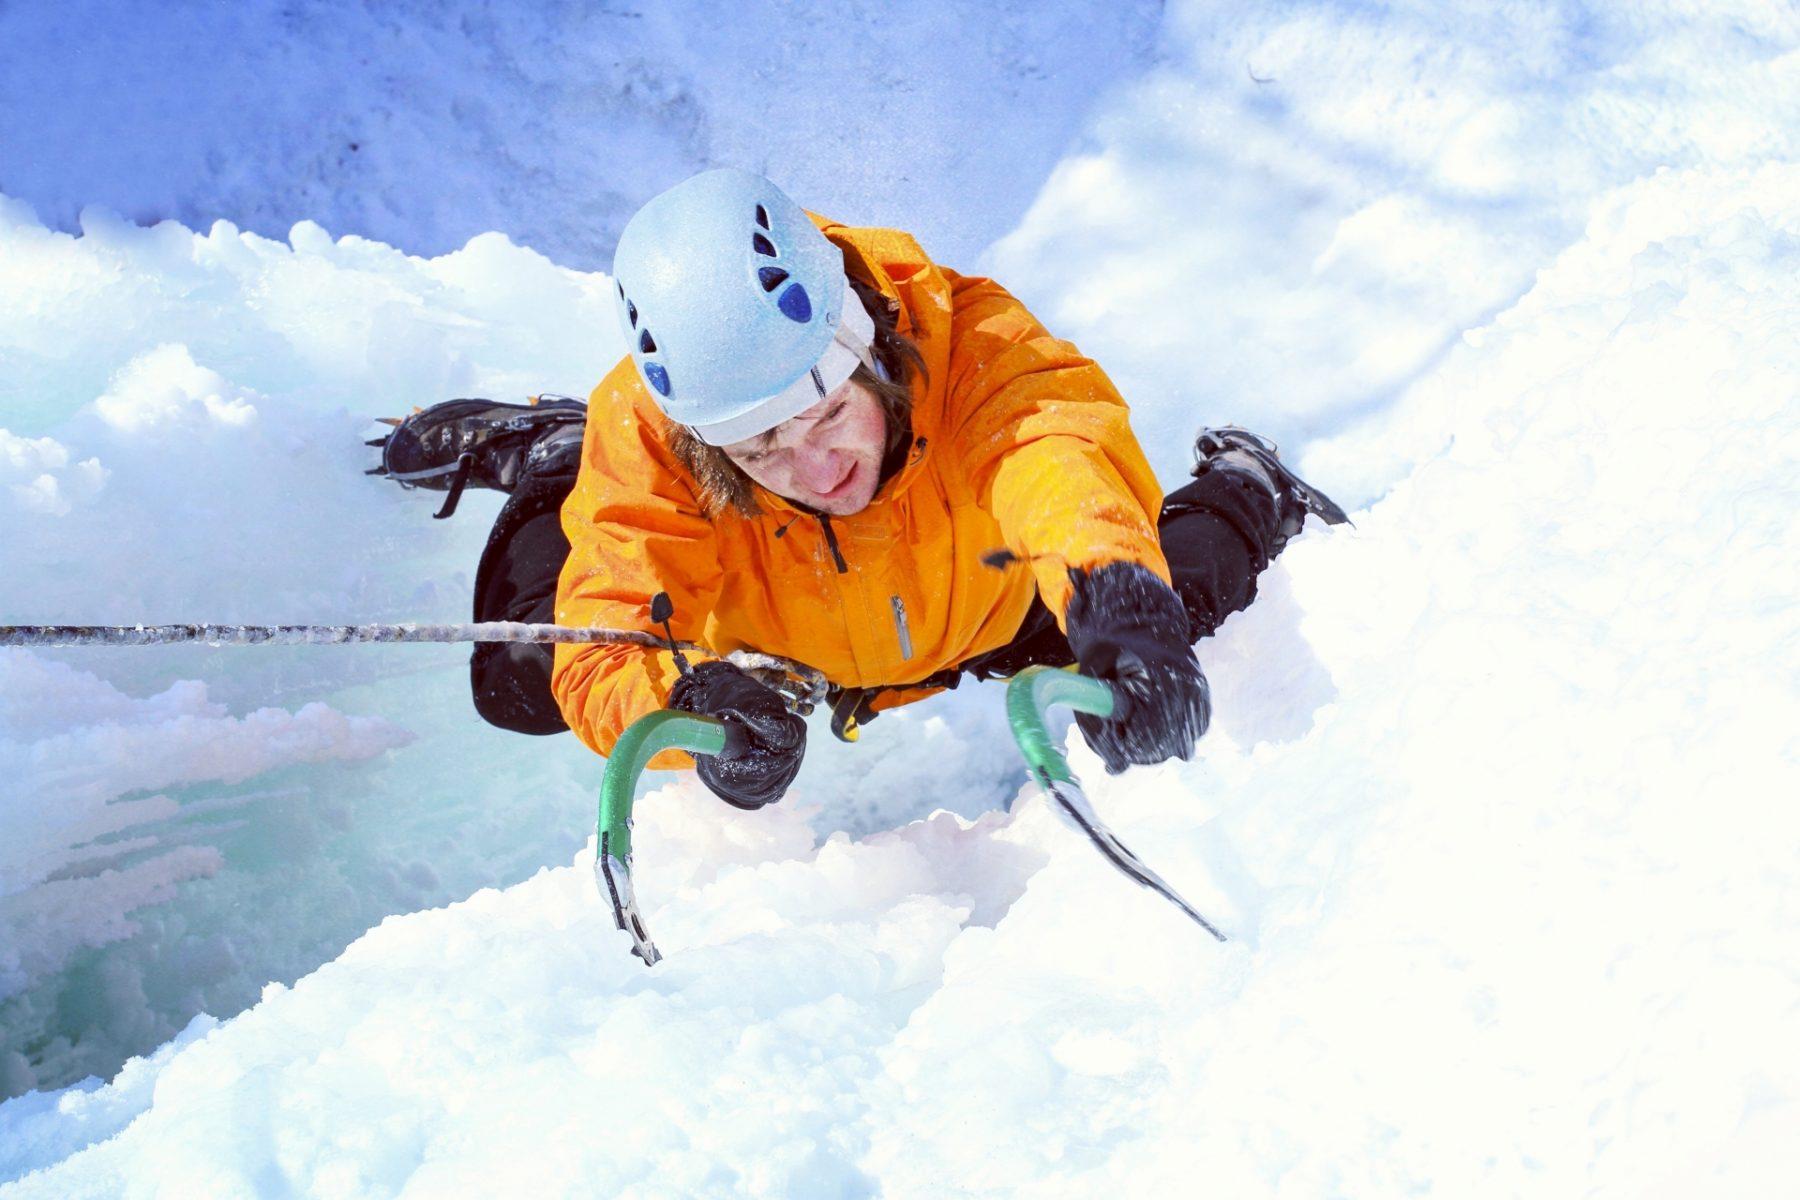 Viaggio nelle Rocky Mountains invernali iceclimbing